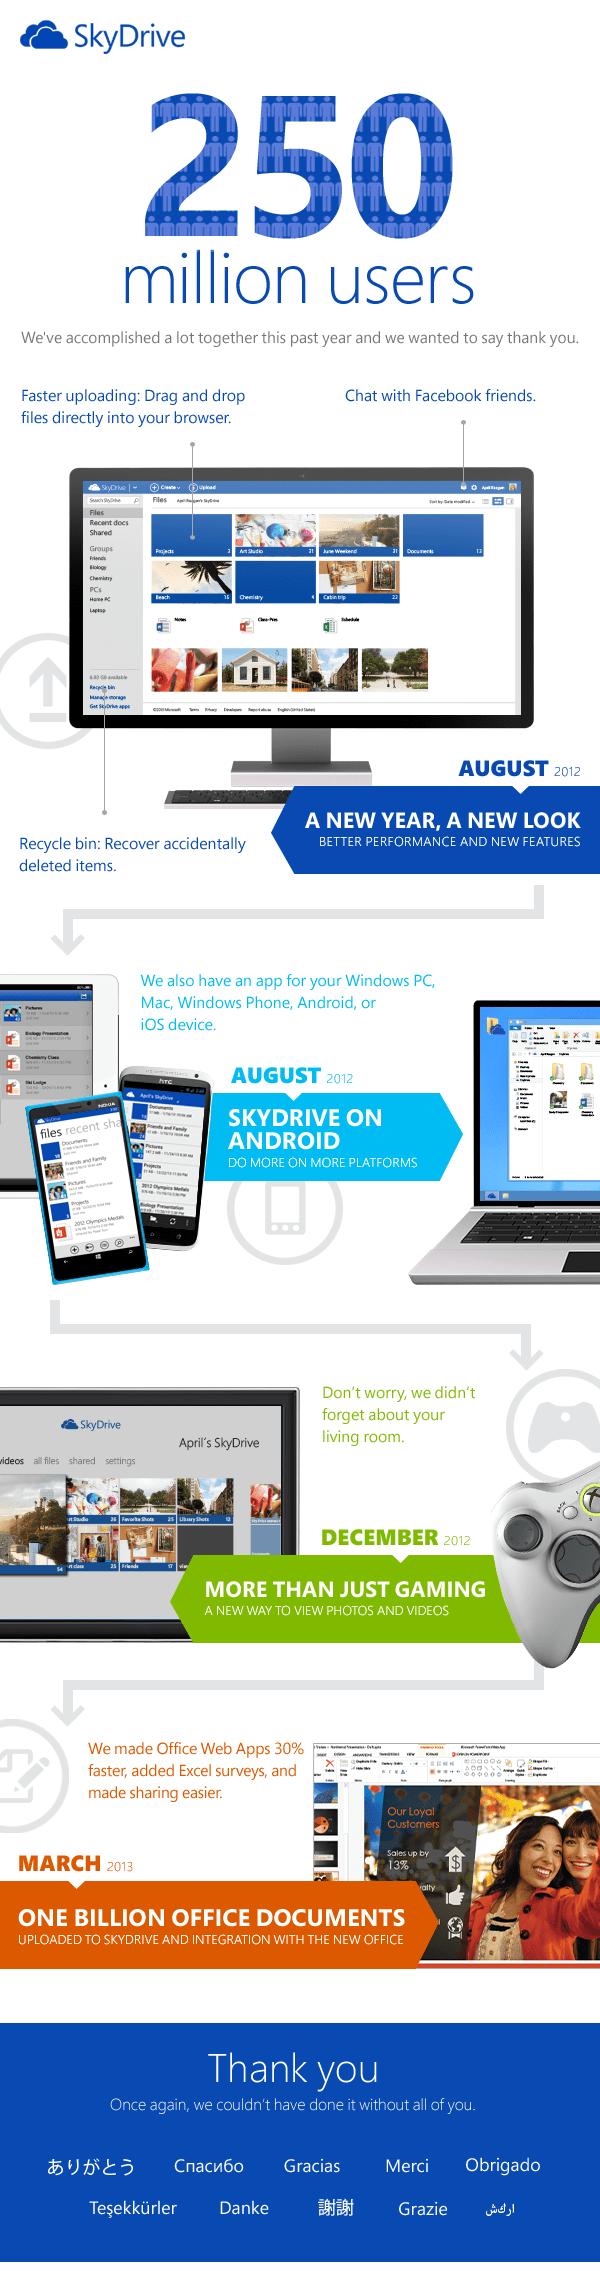 SkyDrive-Anniversary_thumb_0F92E994